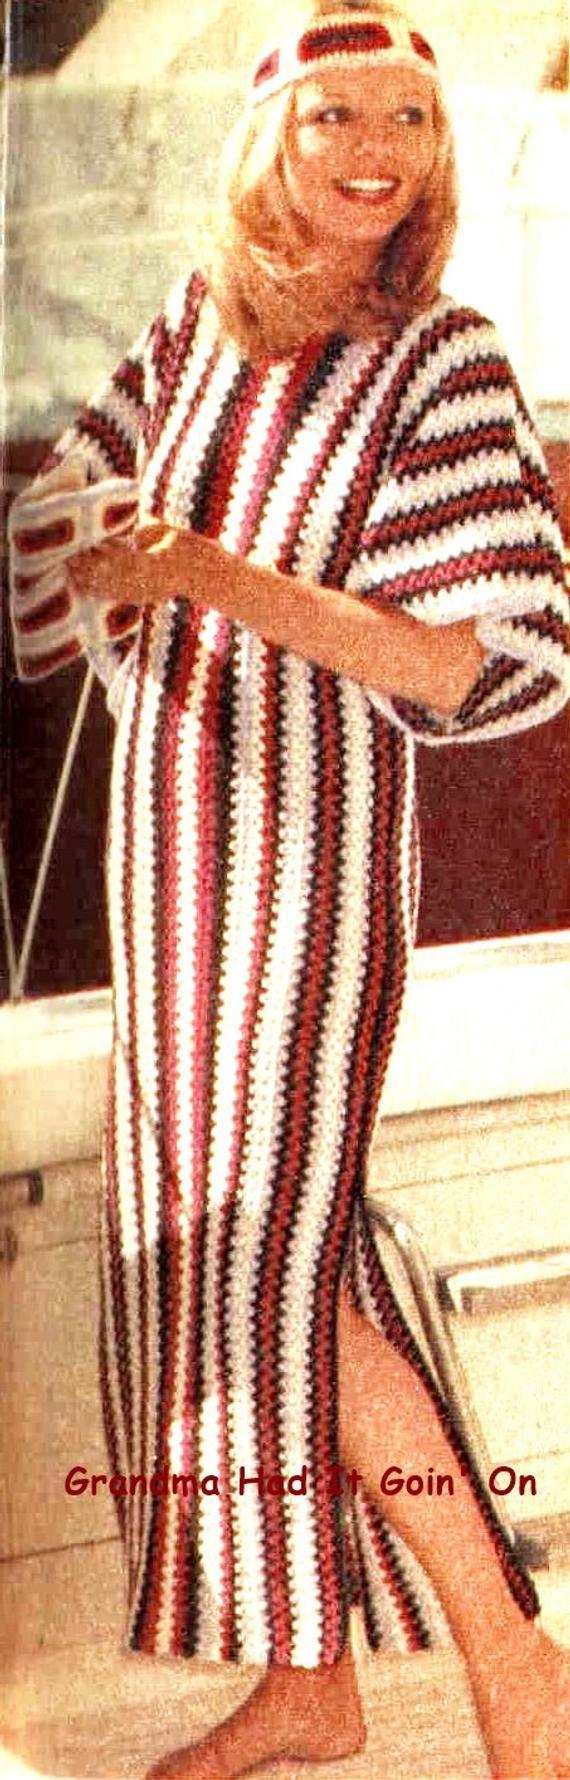 Vintage Crochet Pattern - Caftan Dress - Striped Long Beach Dress - Instant Download PDF - Ladies Boho Peasant Dress - Patio Lounge Dress #crochetbeachdress